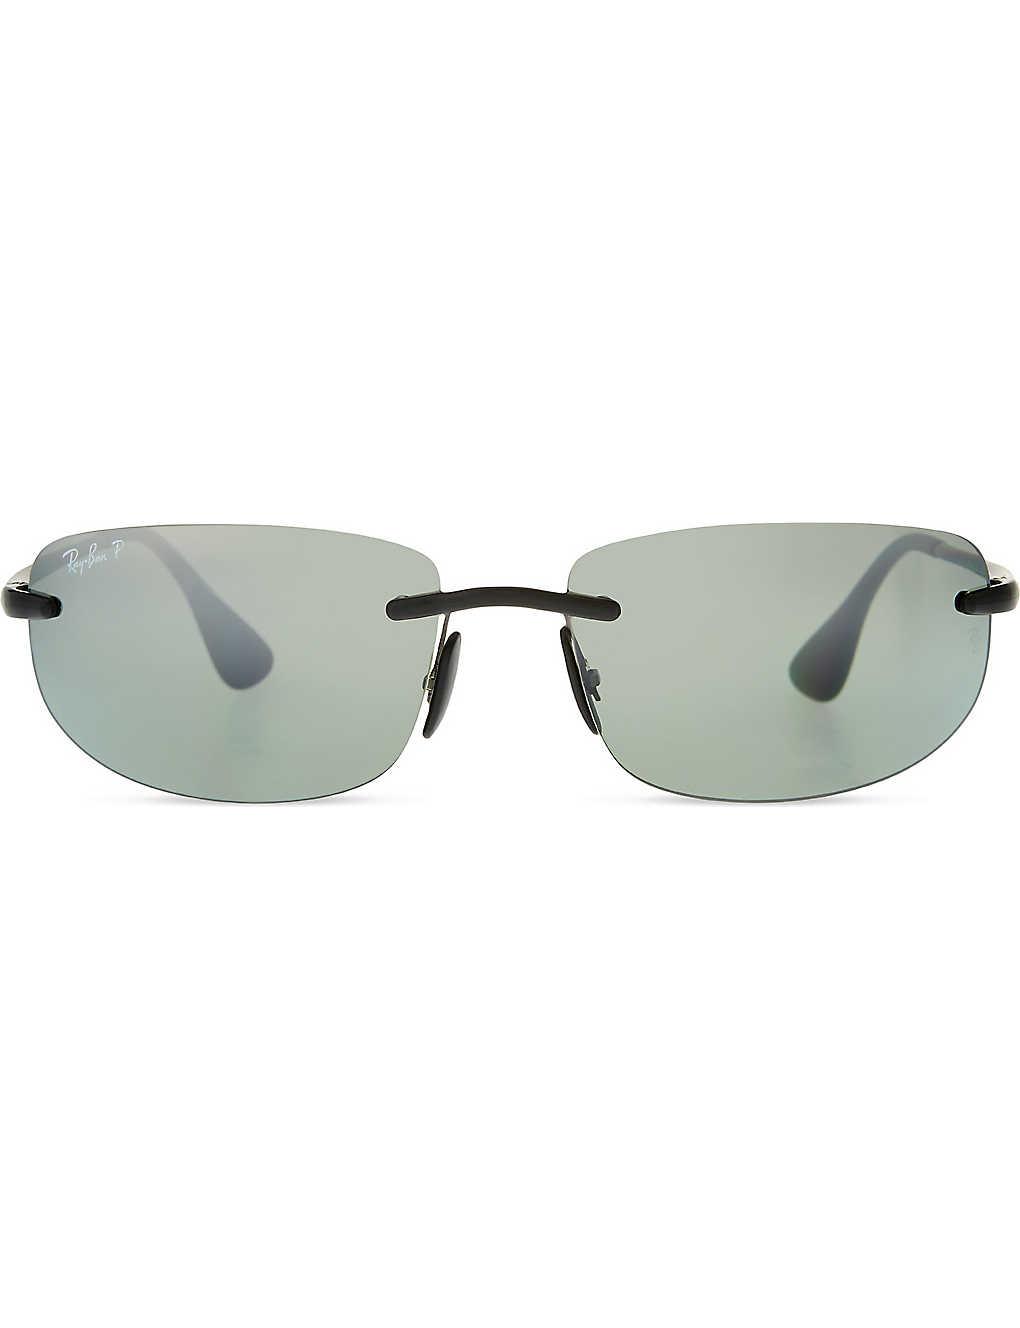 d82a24fe3e73 RAY-BAN - Rb4254 chromance rectangle sunglasses | Selfridges.com